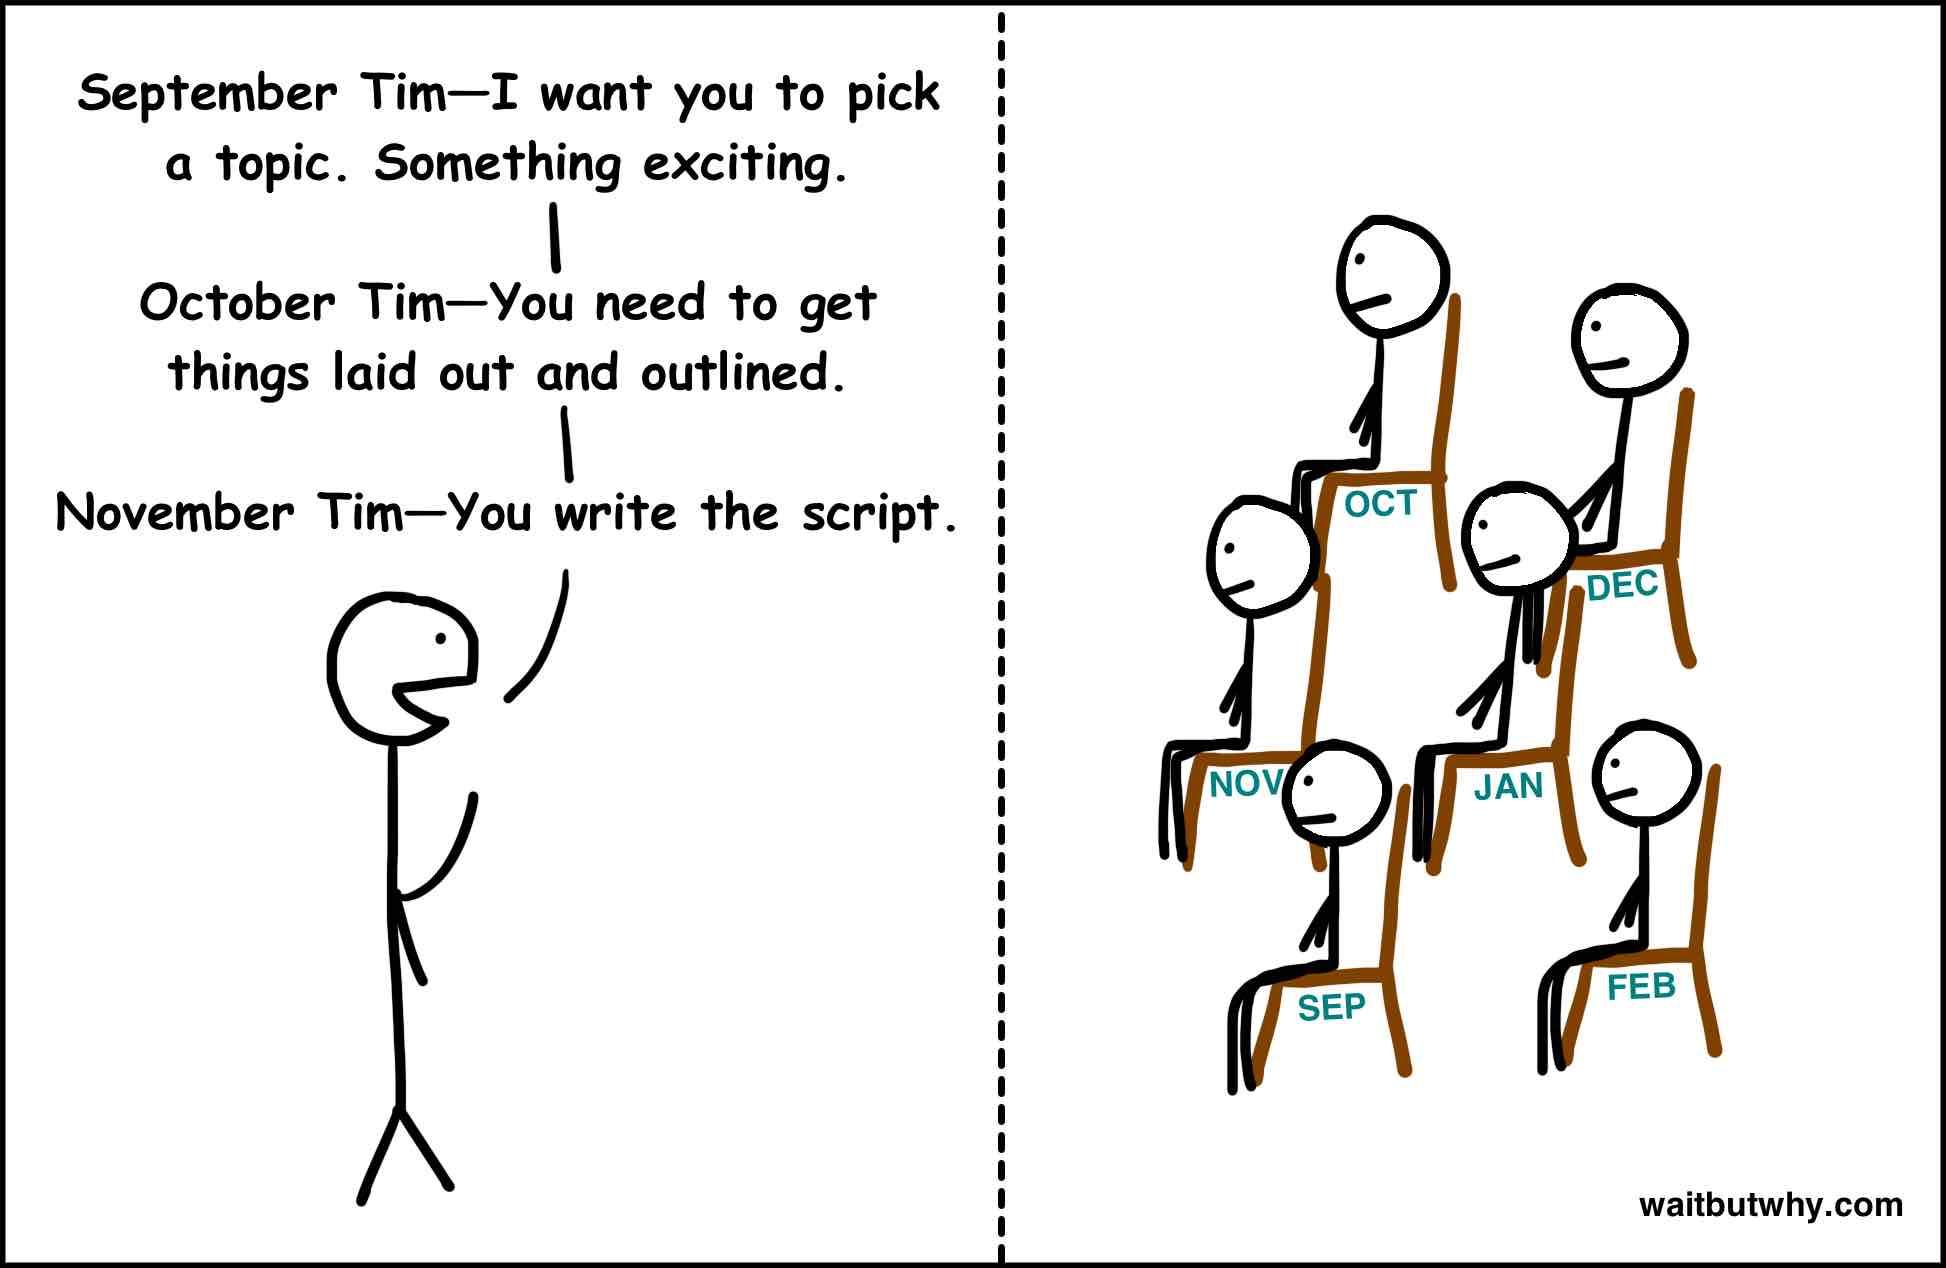 Aug Tim instructions 2